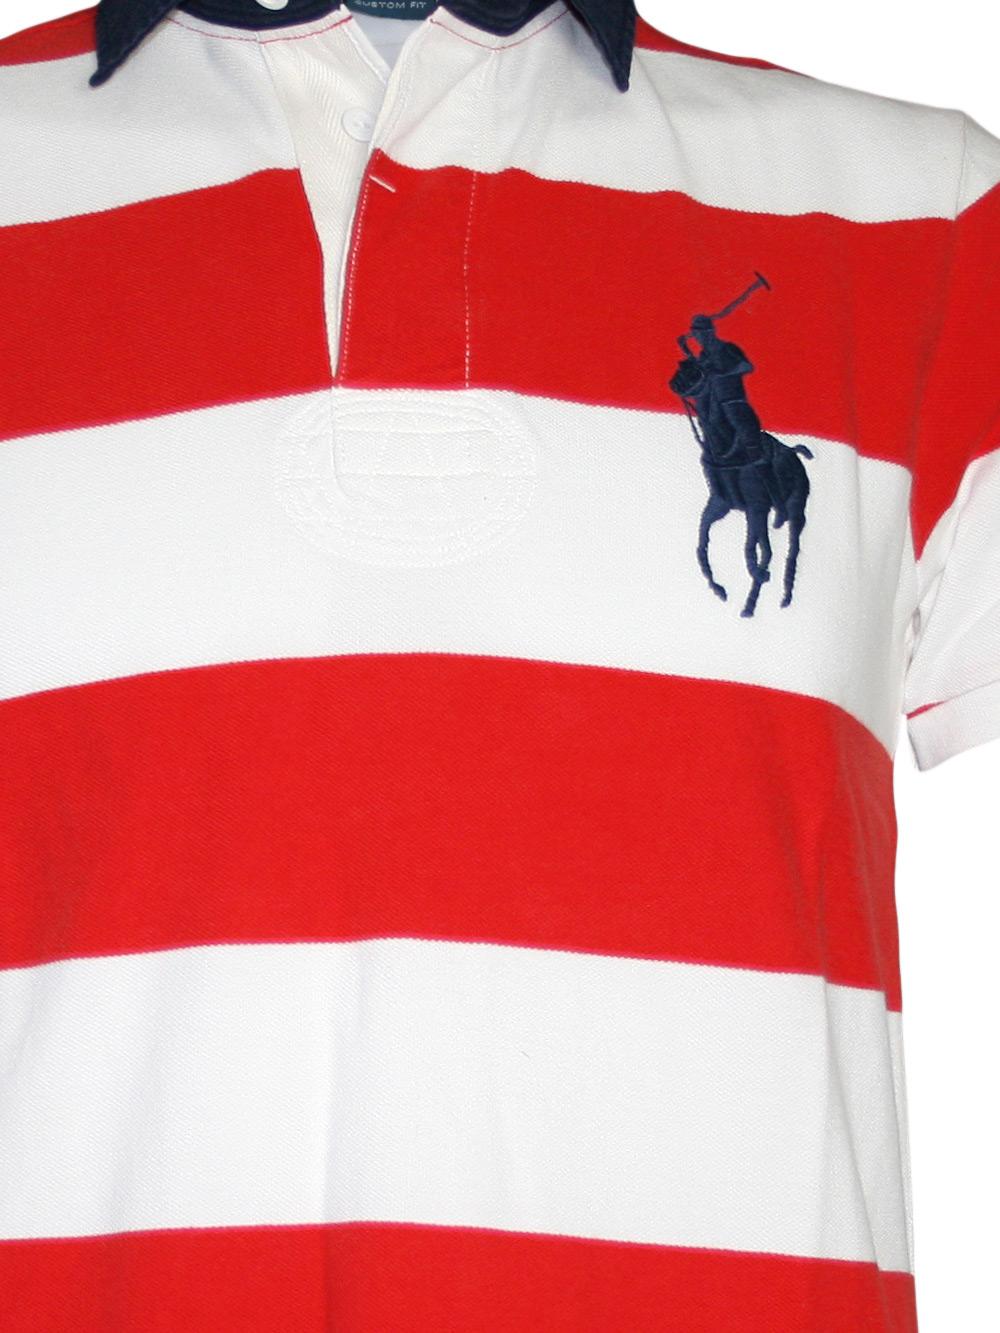 ralph lauren herren polo shirt striped pony rot weiss neu ebay. Black Bedroom Furniture Sets. Home Design Ideas